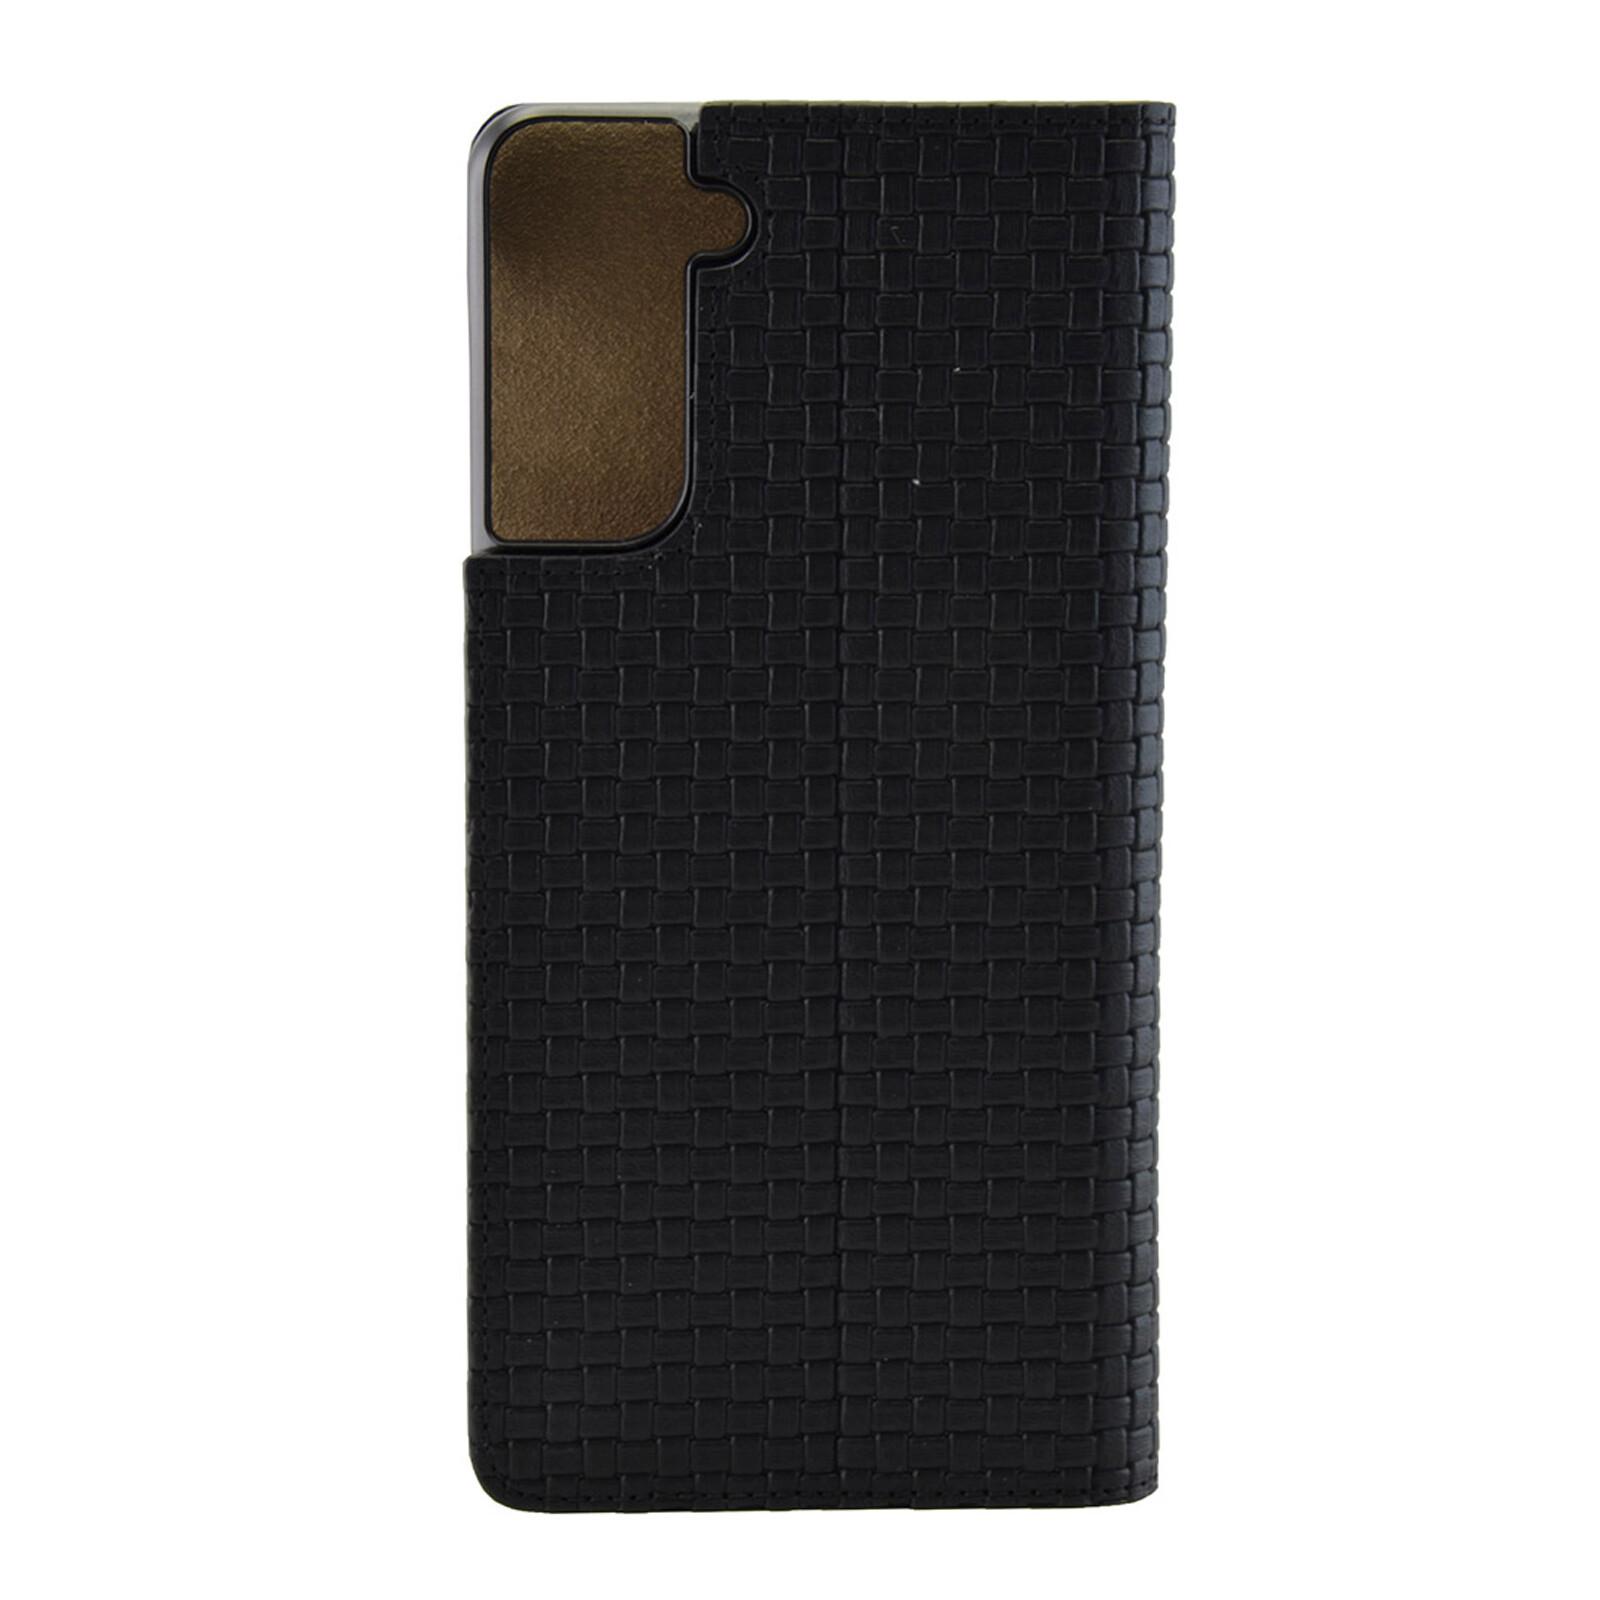 Galeli Book ENZO Samsung Galaxy S21 classy black